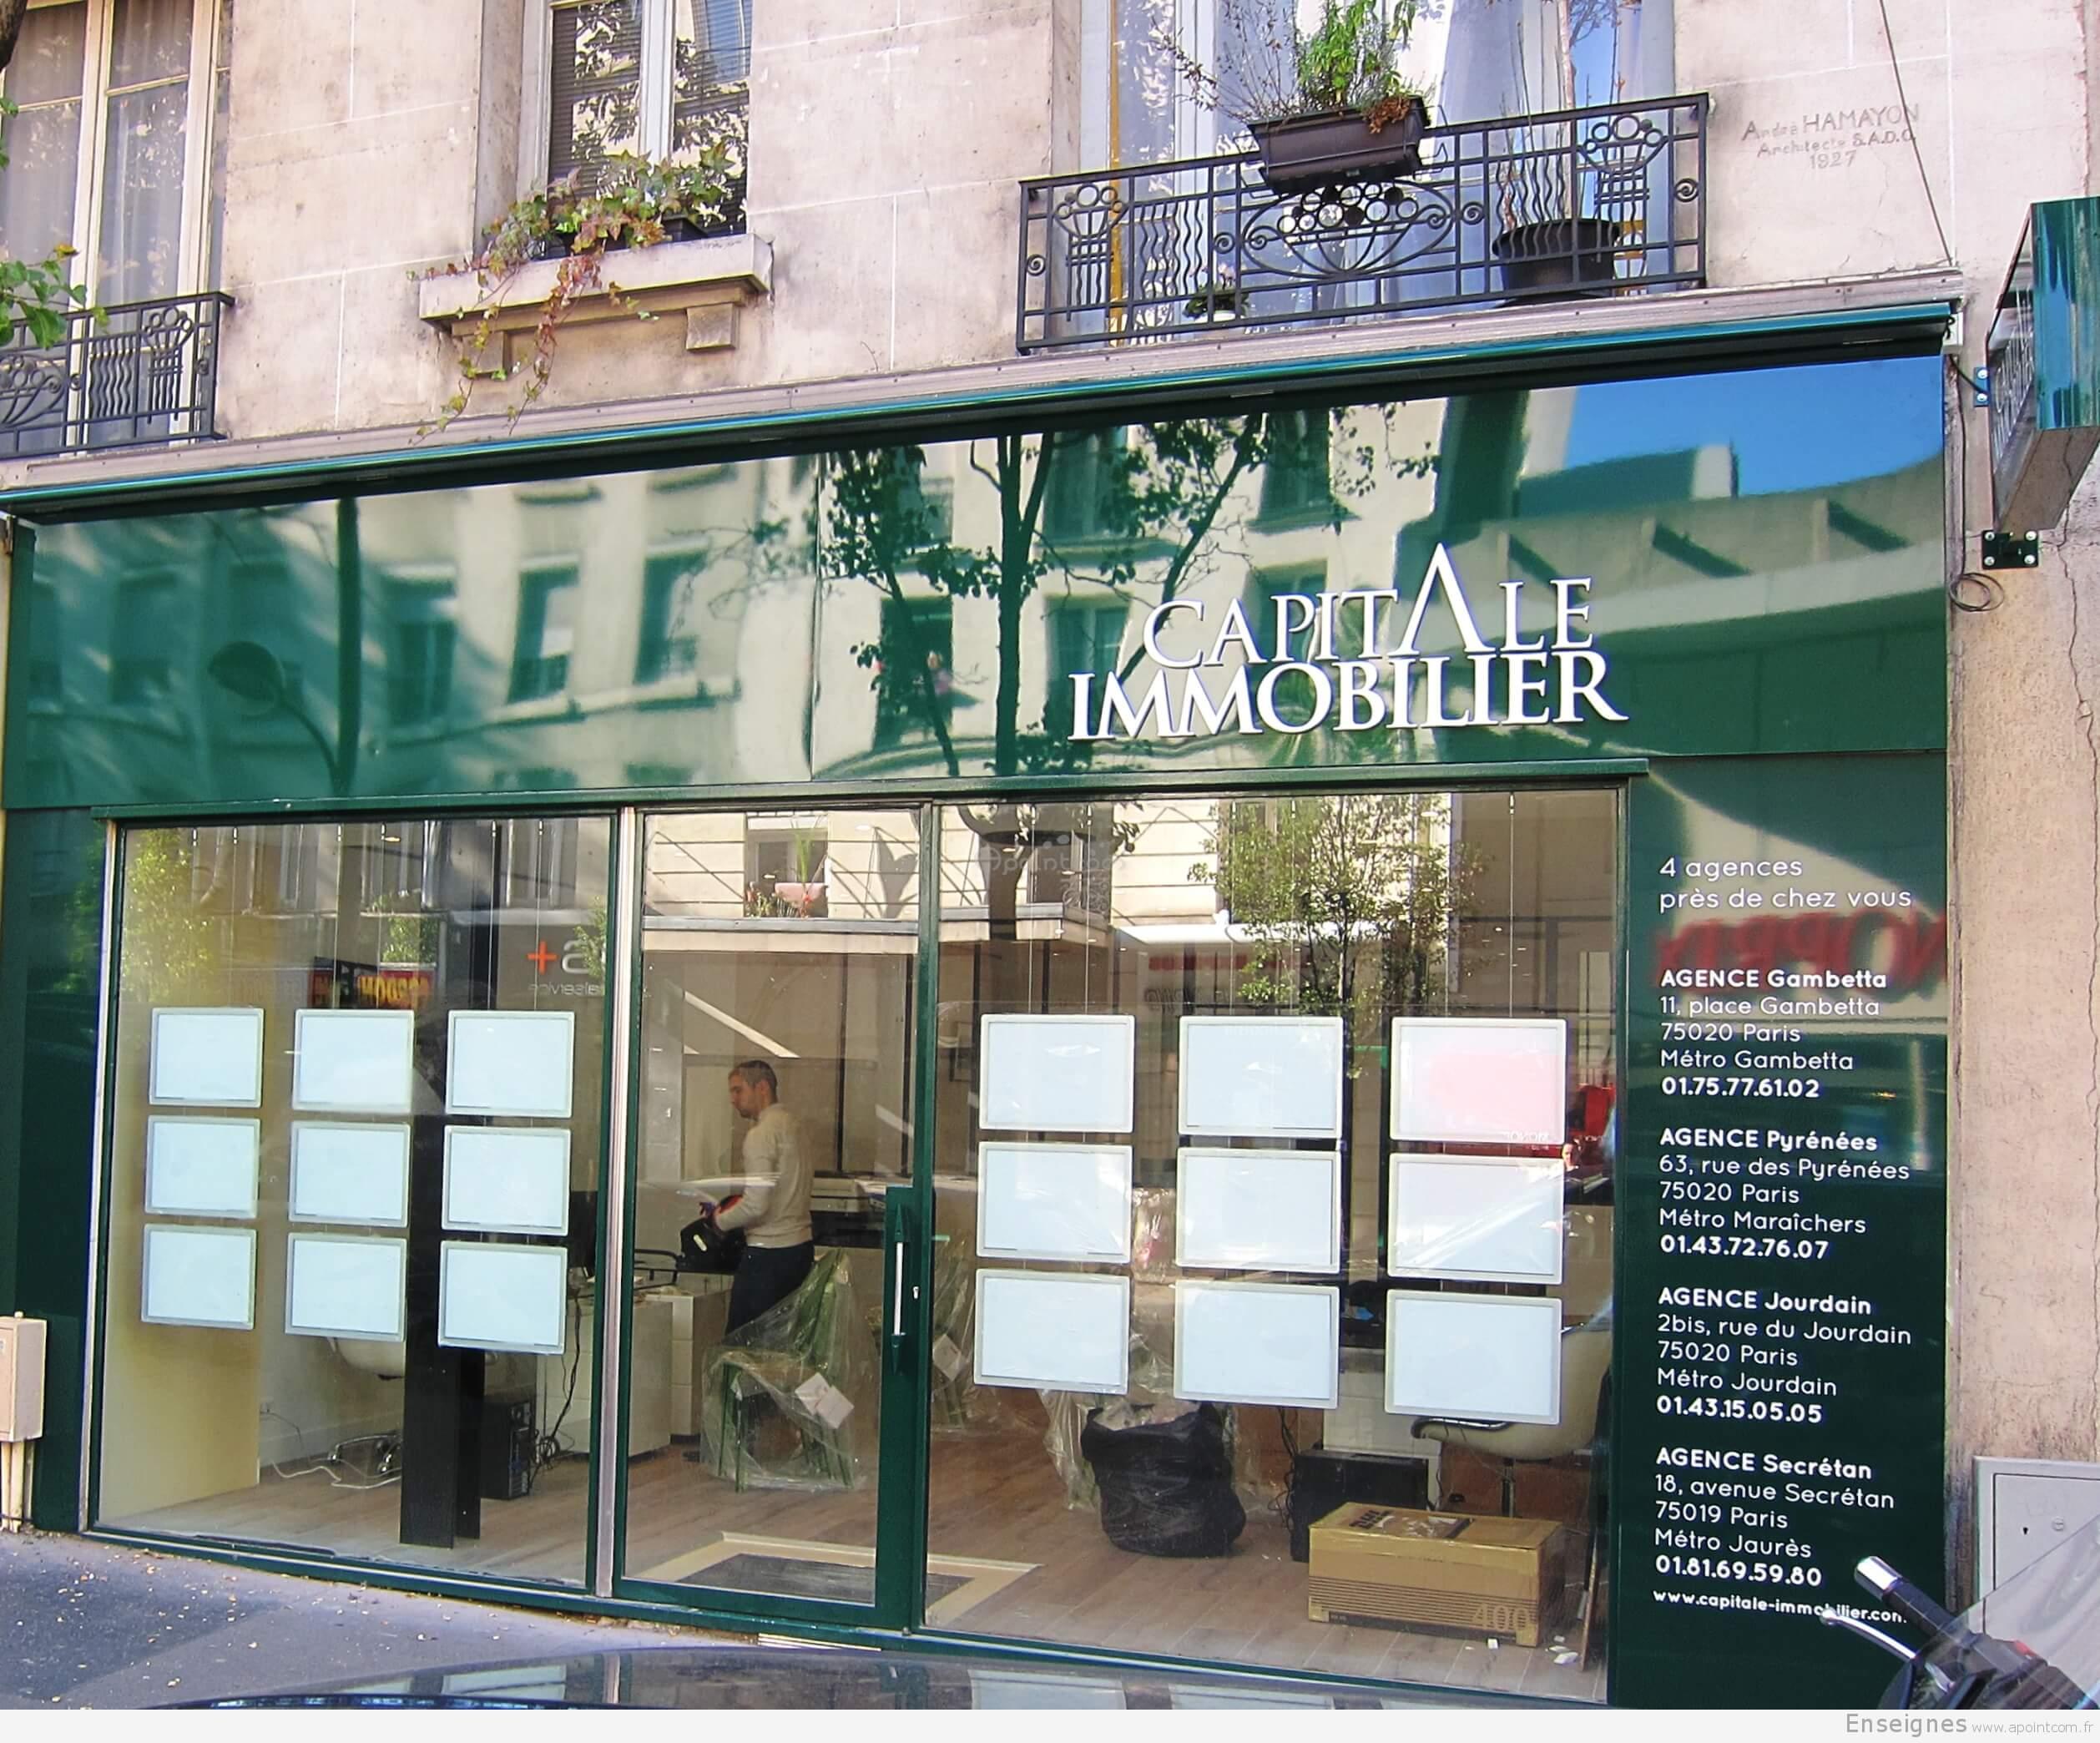 Enseigne agence immobili re paris capital immobilier for Agence immobiliere paris